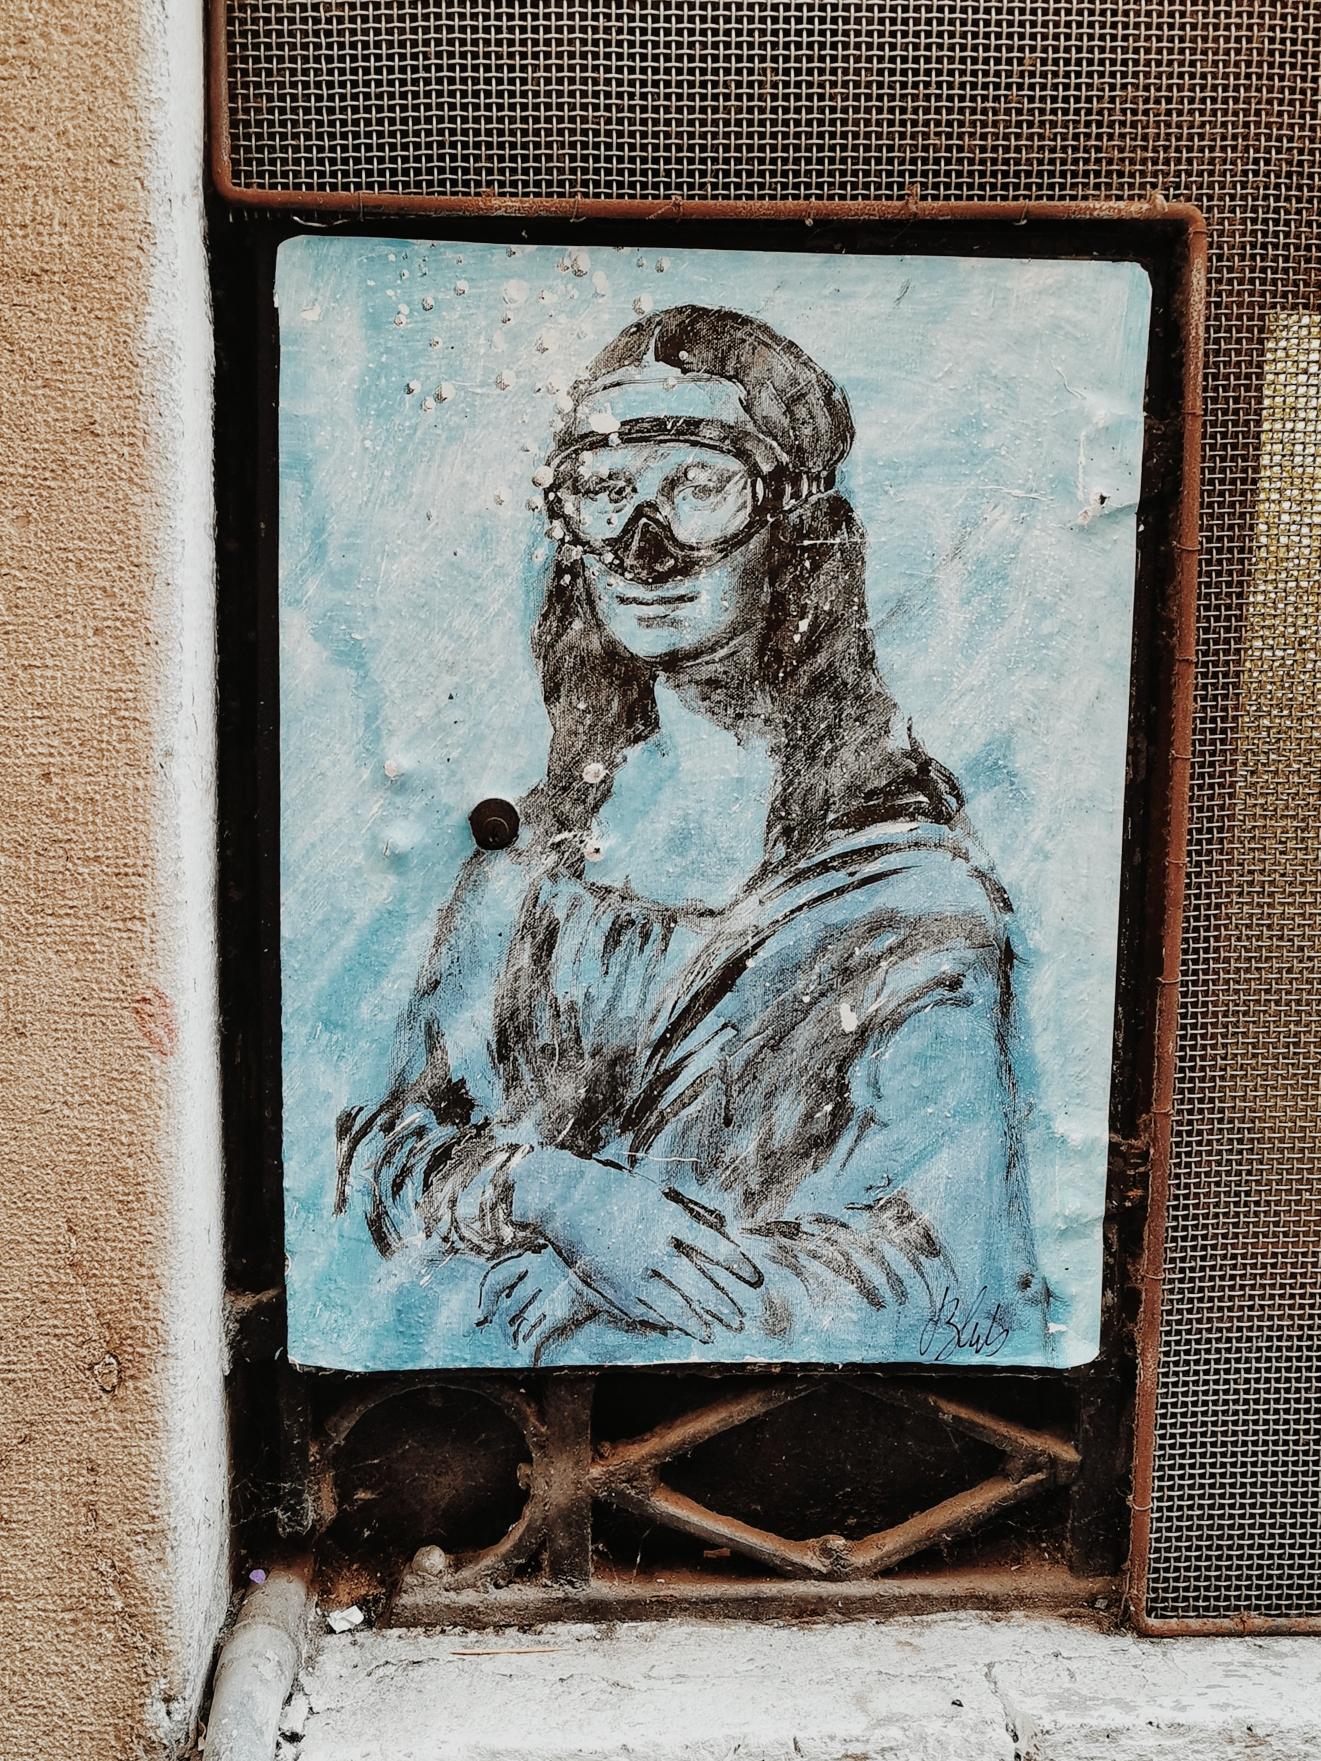 Venezia fuori dai luoghi famosi - Street art